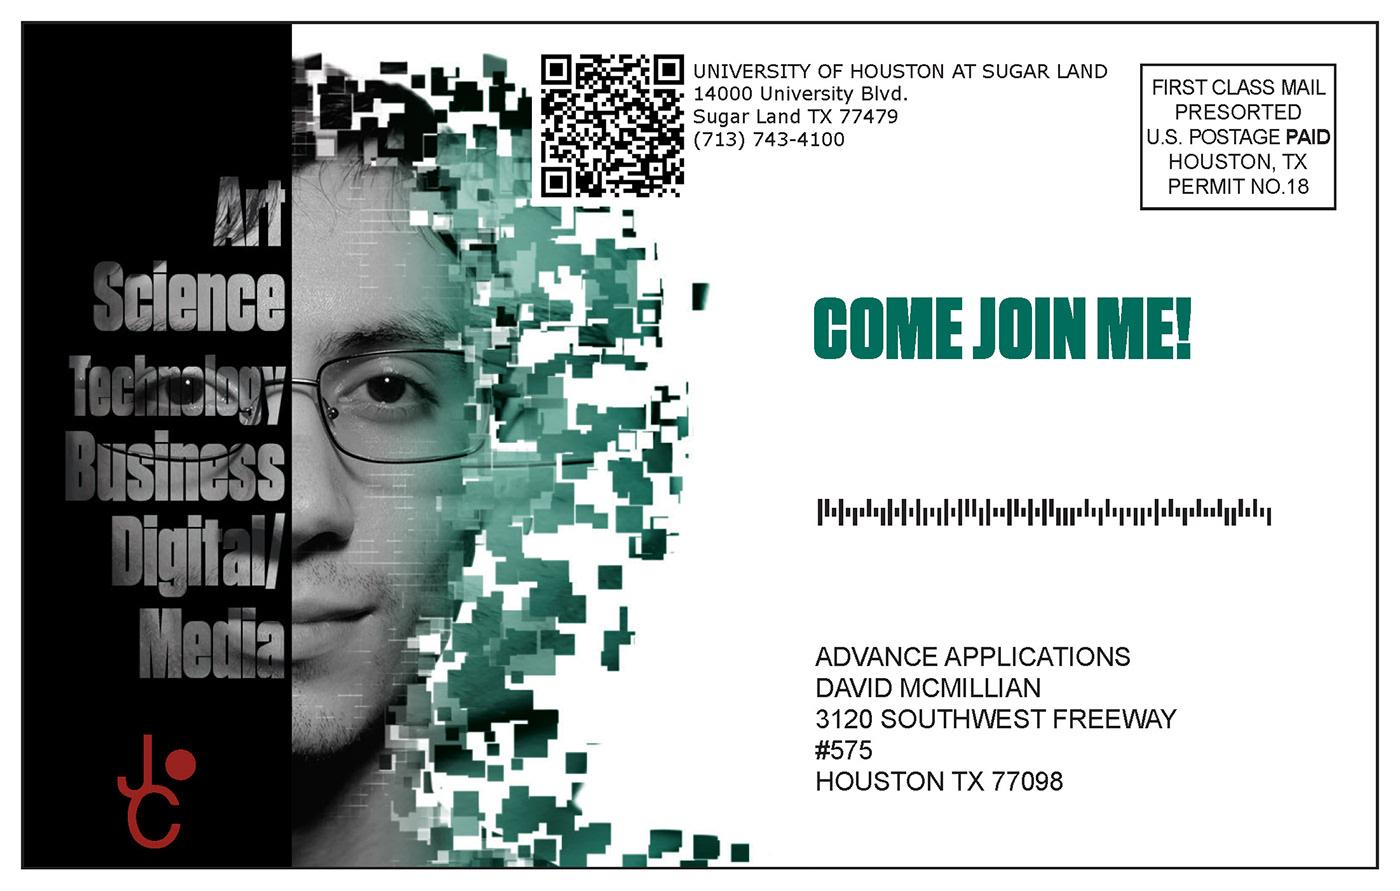 adobe design digital media Invitation postcard qr Technology University of Houston variable data xmpie